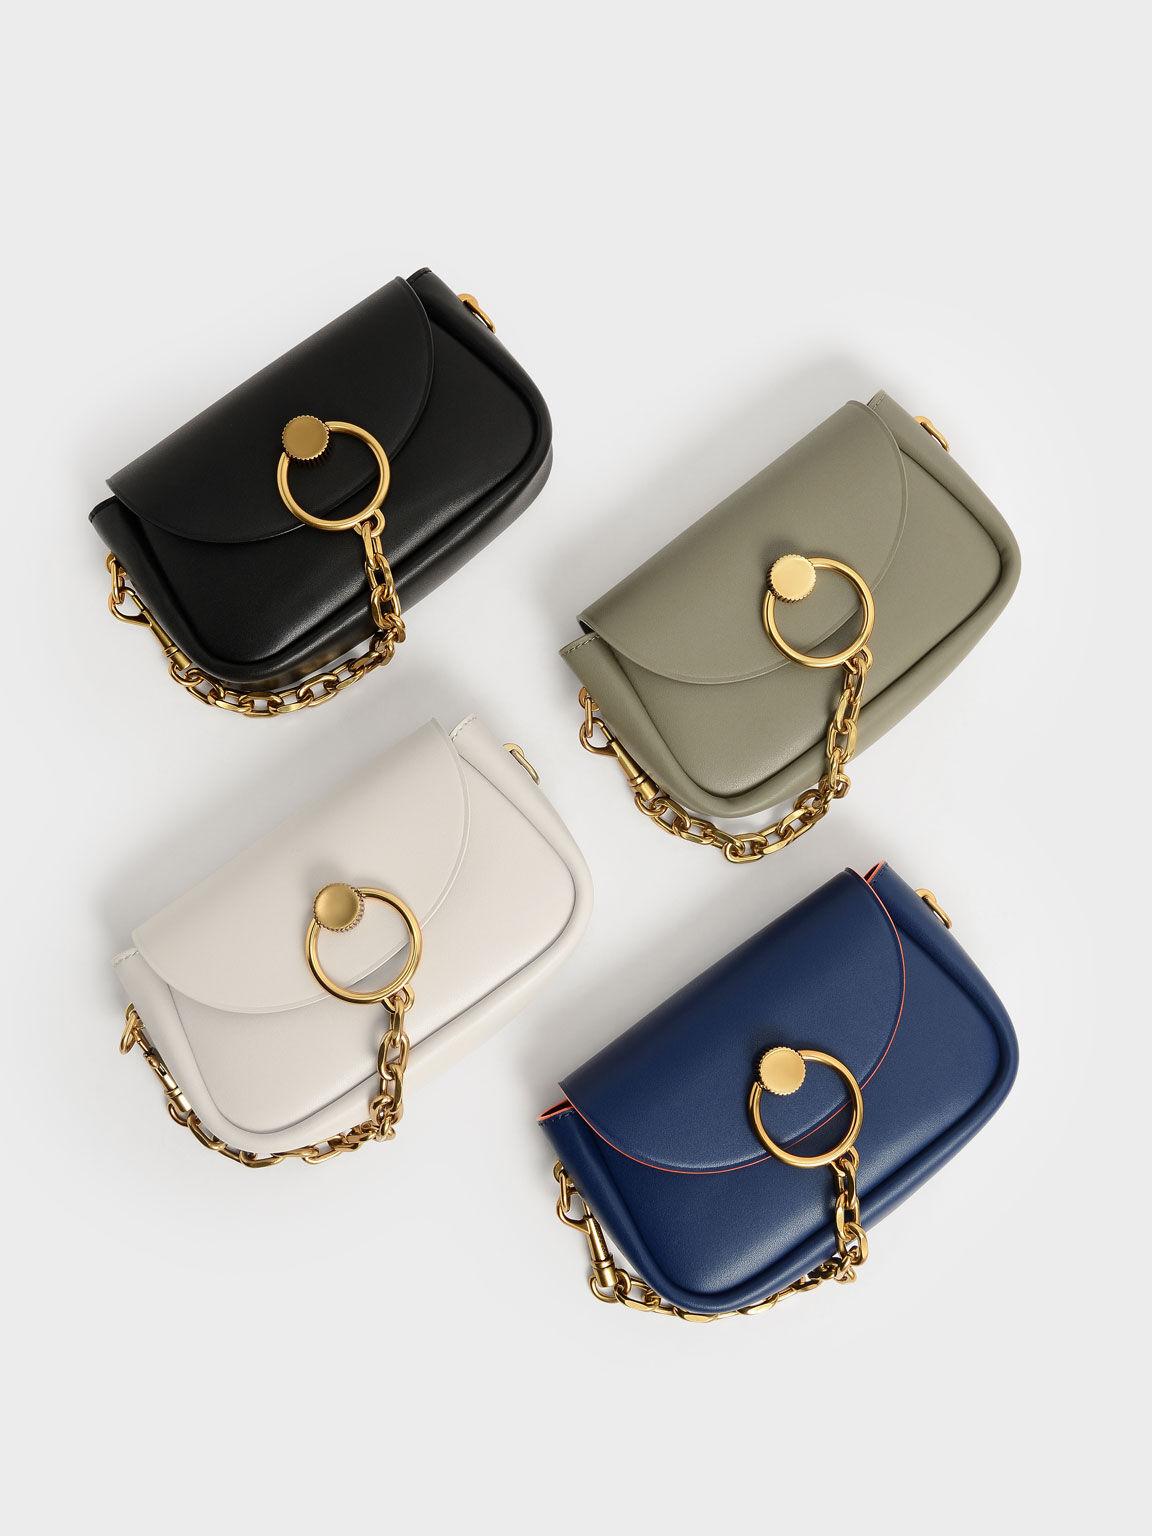 Chunky Chain-Link Crossbody Bag, Navy, hi-res